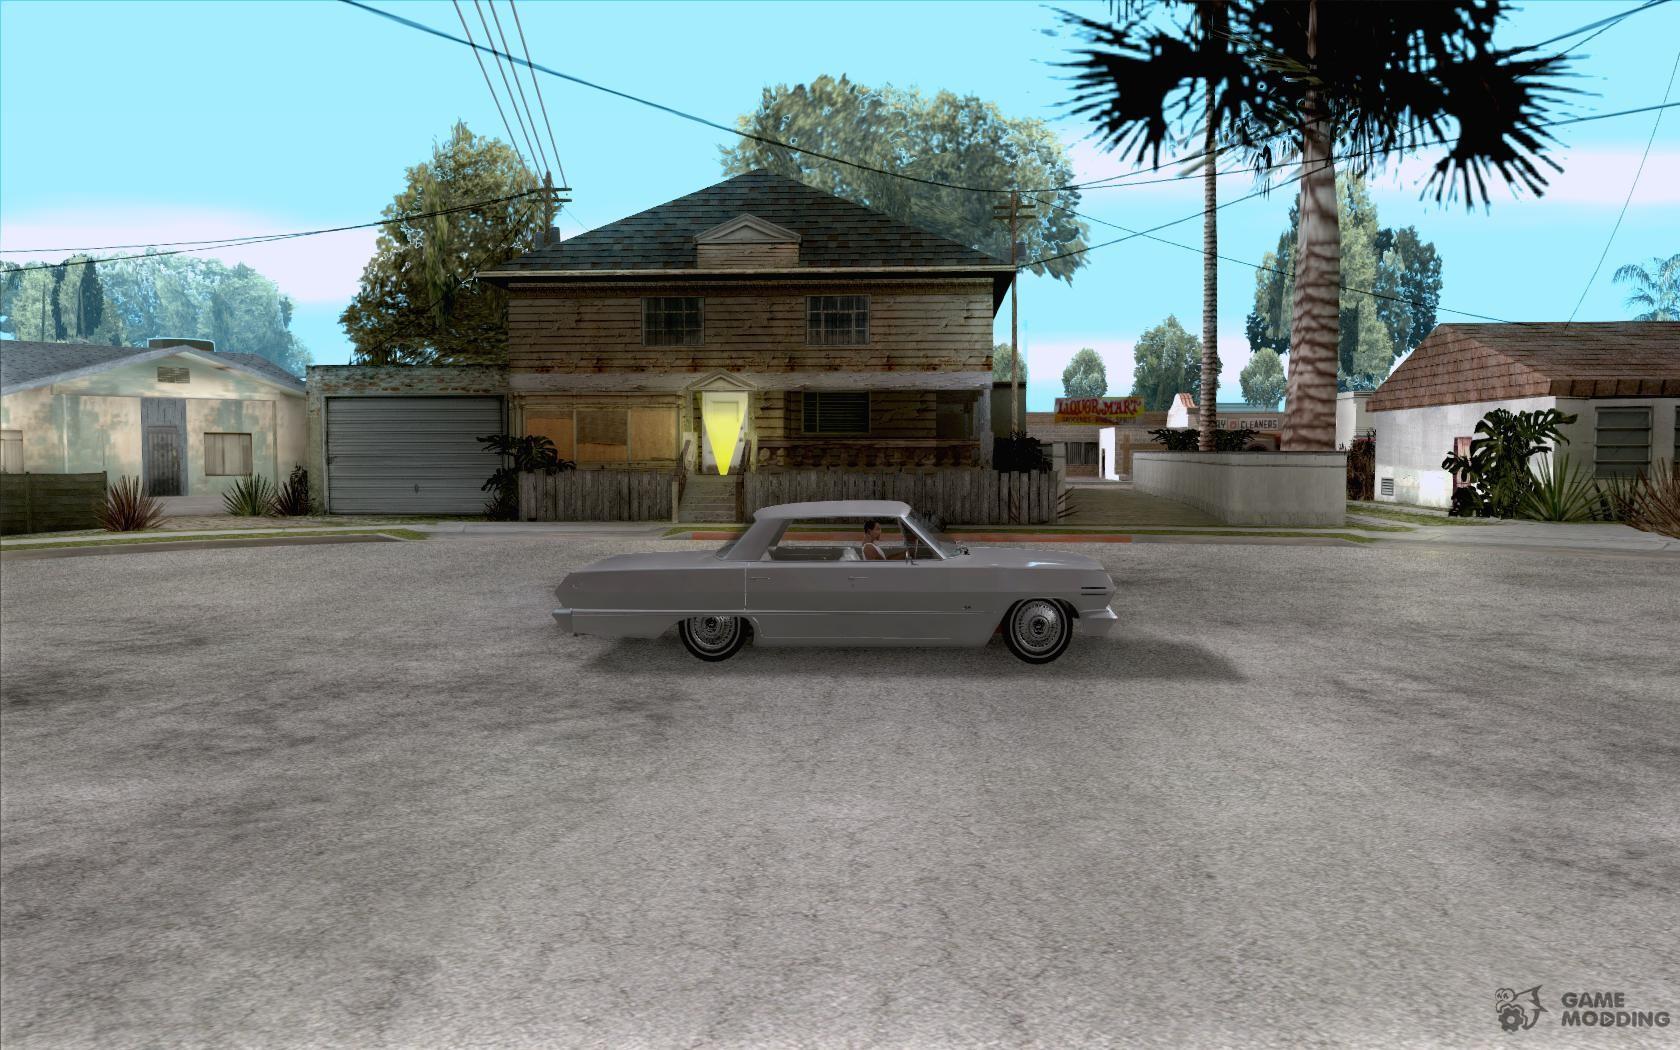 Chevrolet impala 4 door hardtop 1963 for gta san andreas - Chevrolet Impala 4 Door Hardtop 1963 For Gta San Andreas Inside View